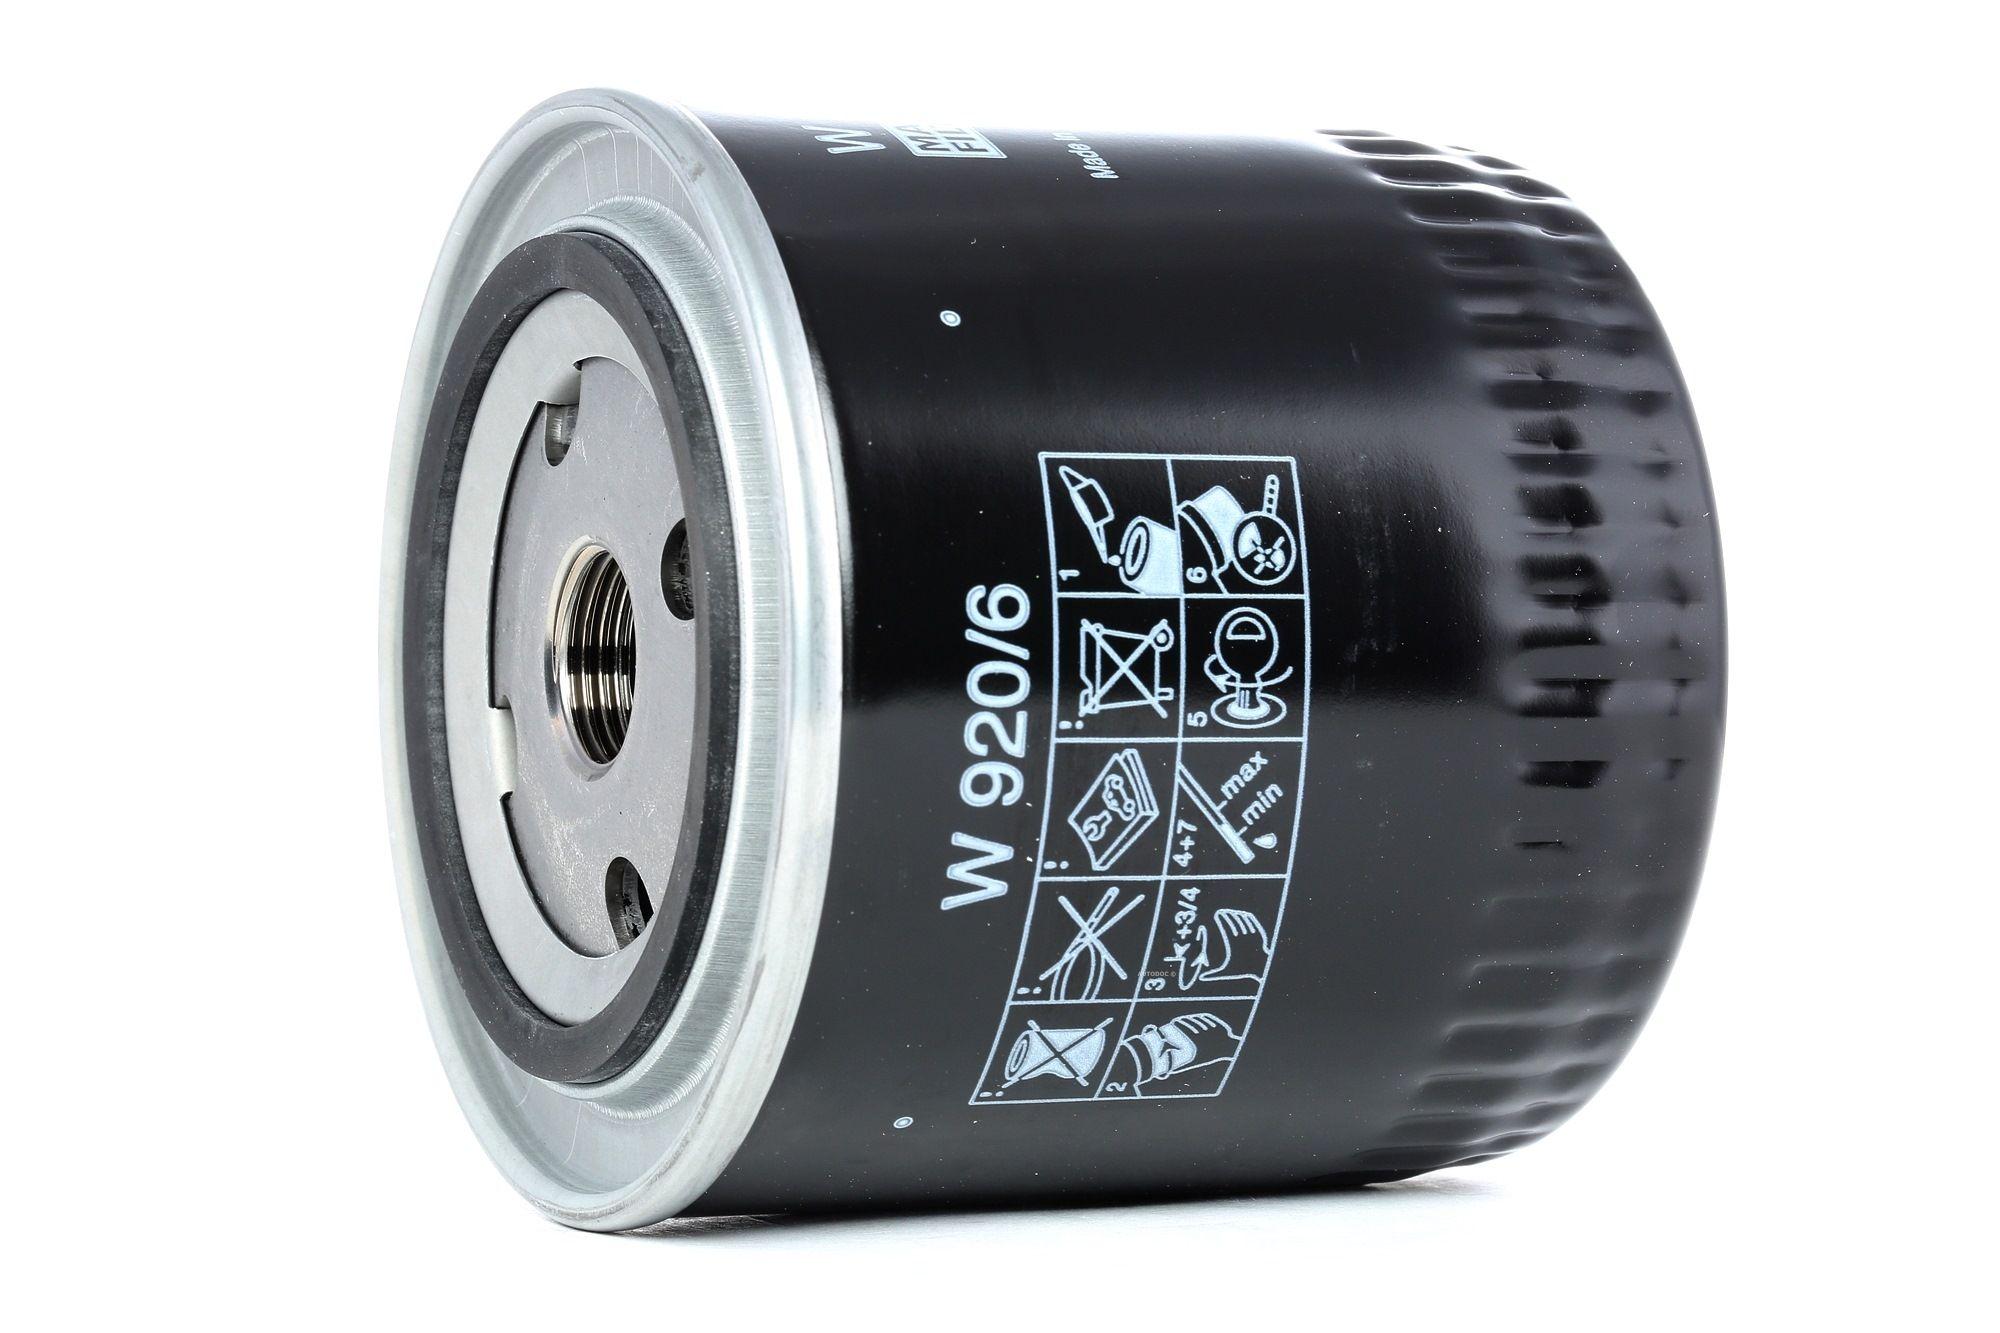 MANN-FILTER: Original Motorölfilter W 920/6 (Innendurchmesser 2: 62mm, Innendurchmesser 2: 62mm, Ø: 93mm, Außendurchmesser 2: 71mm, Höhe: 95mm)